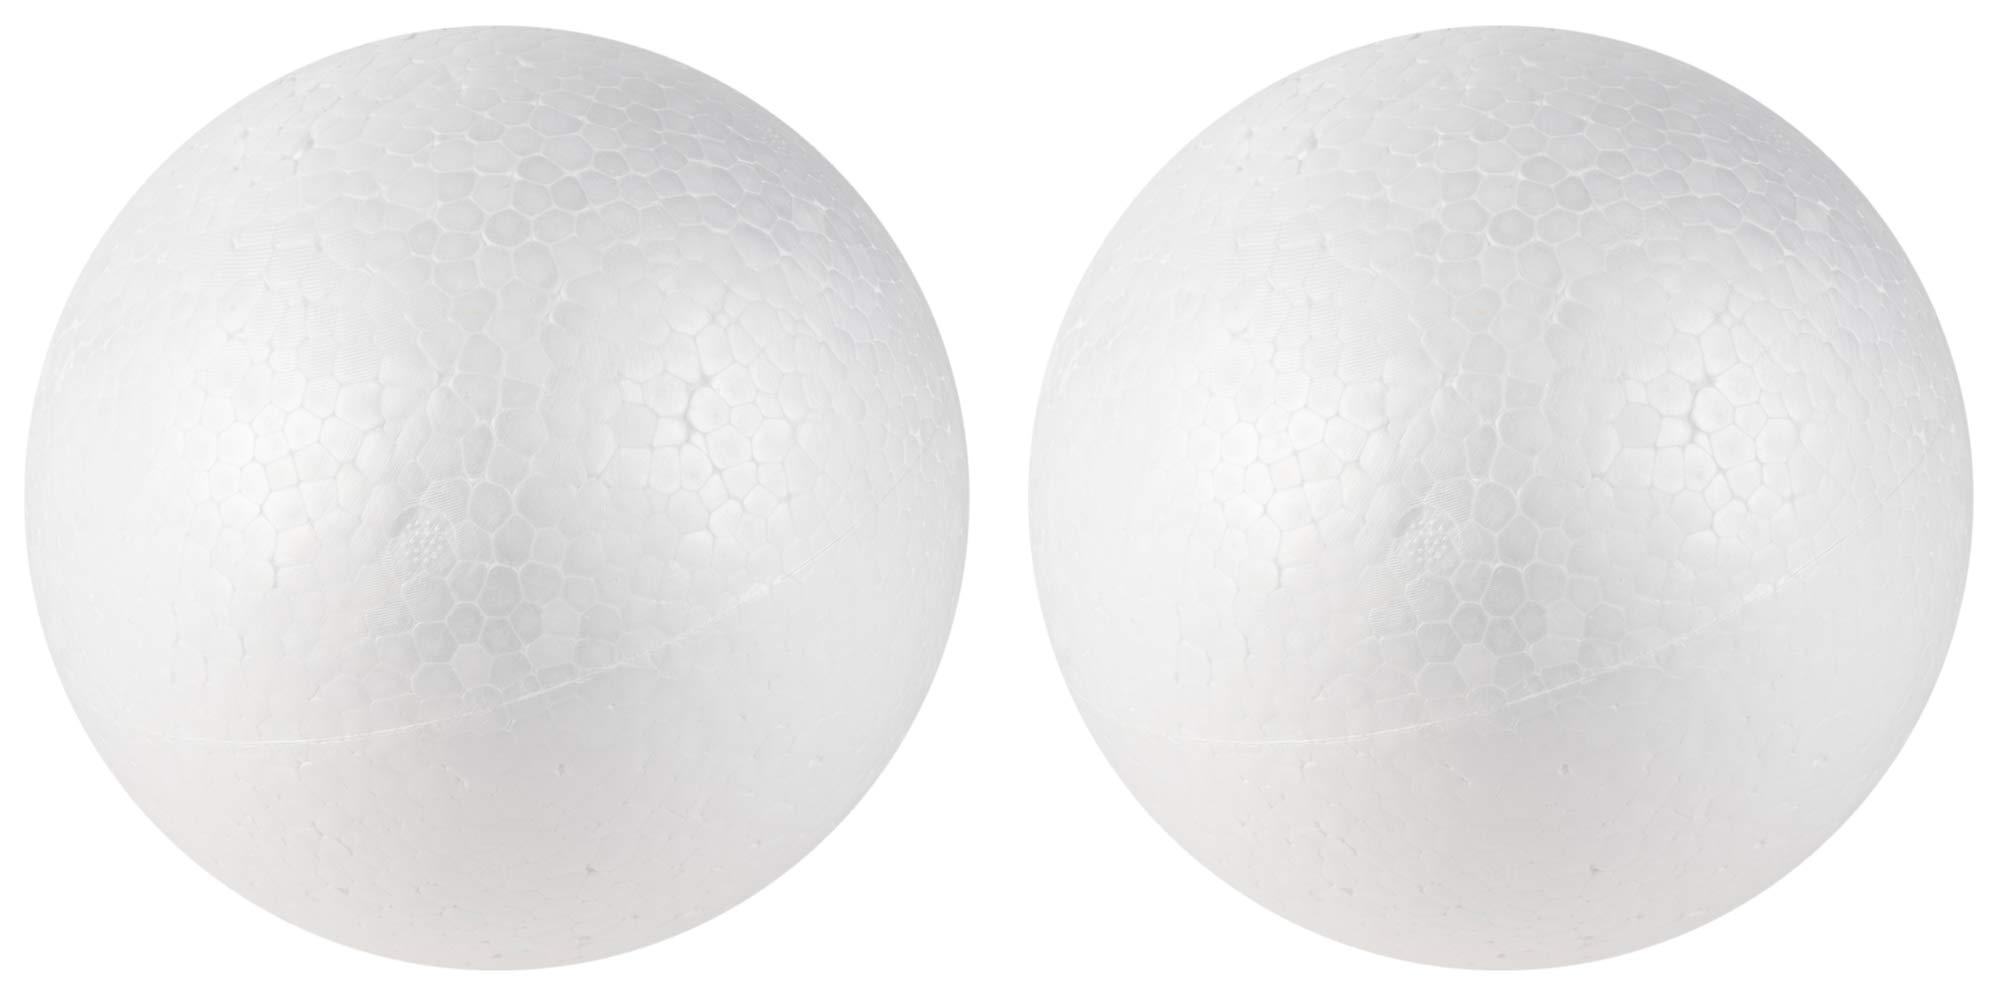 Craft Foam Balls - 2-Pack Large Smooth Round Polystyrene Foam Balls, Craft Supplies